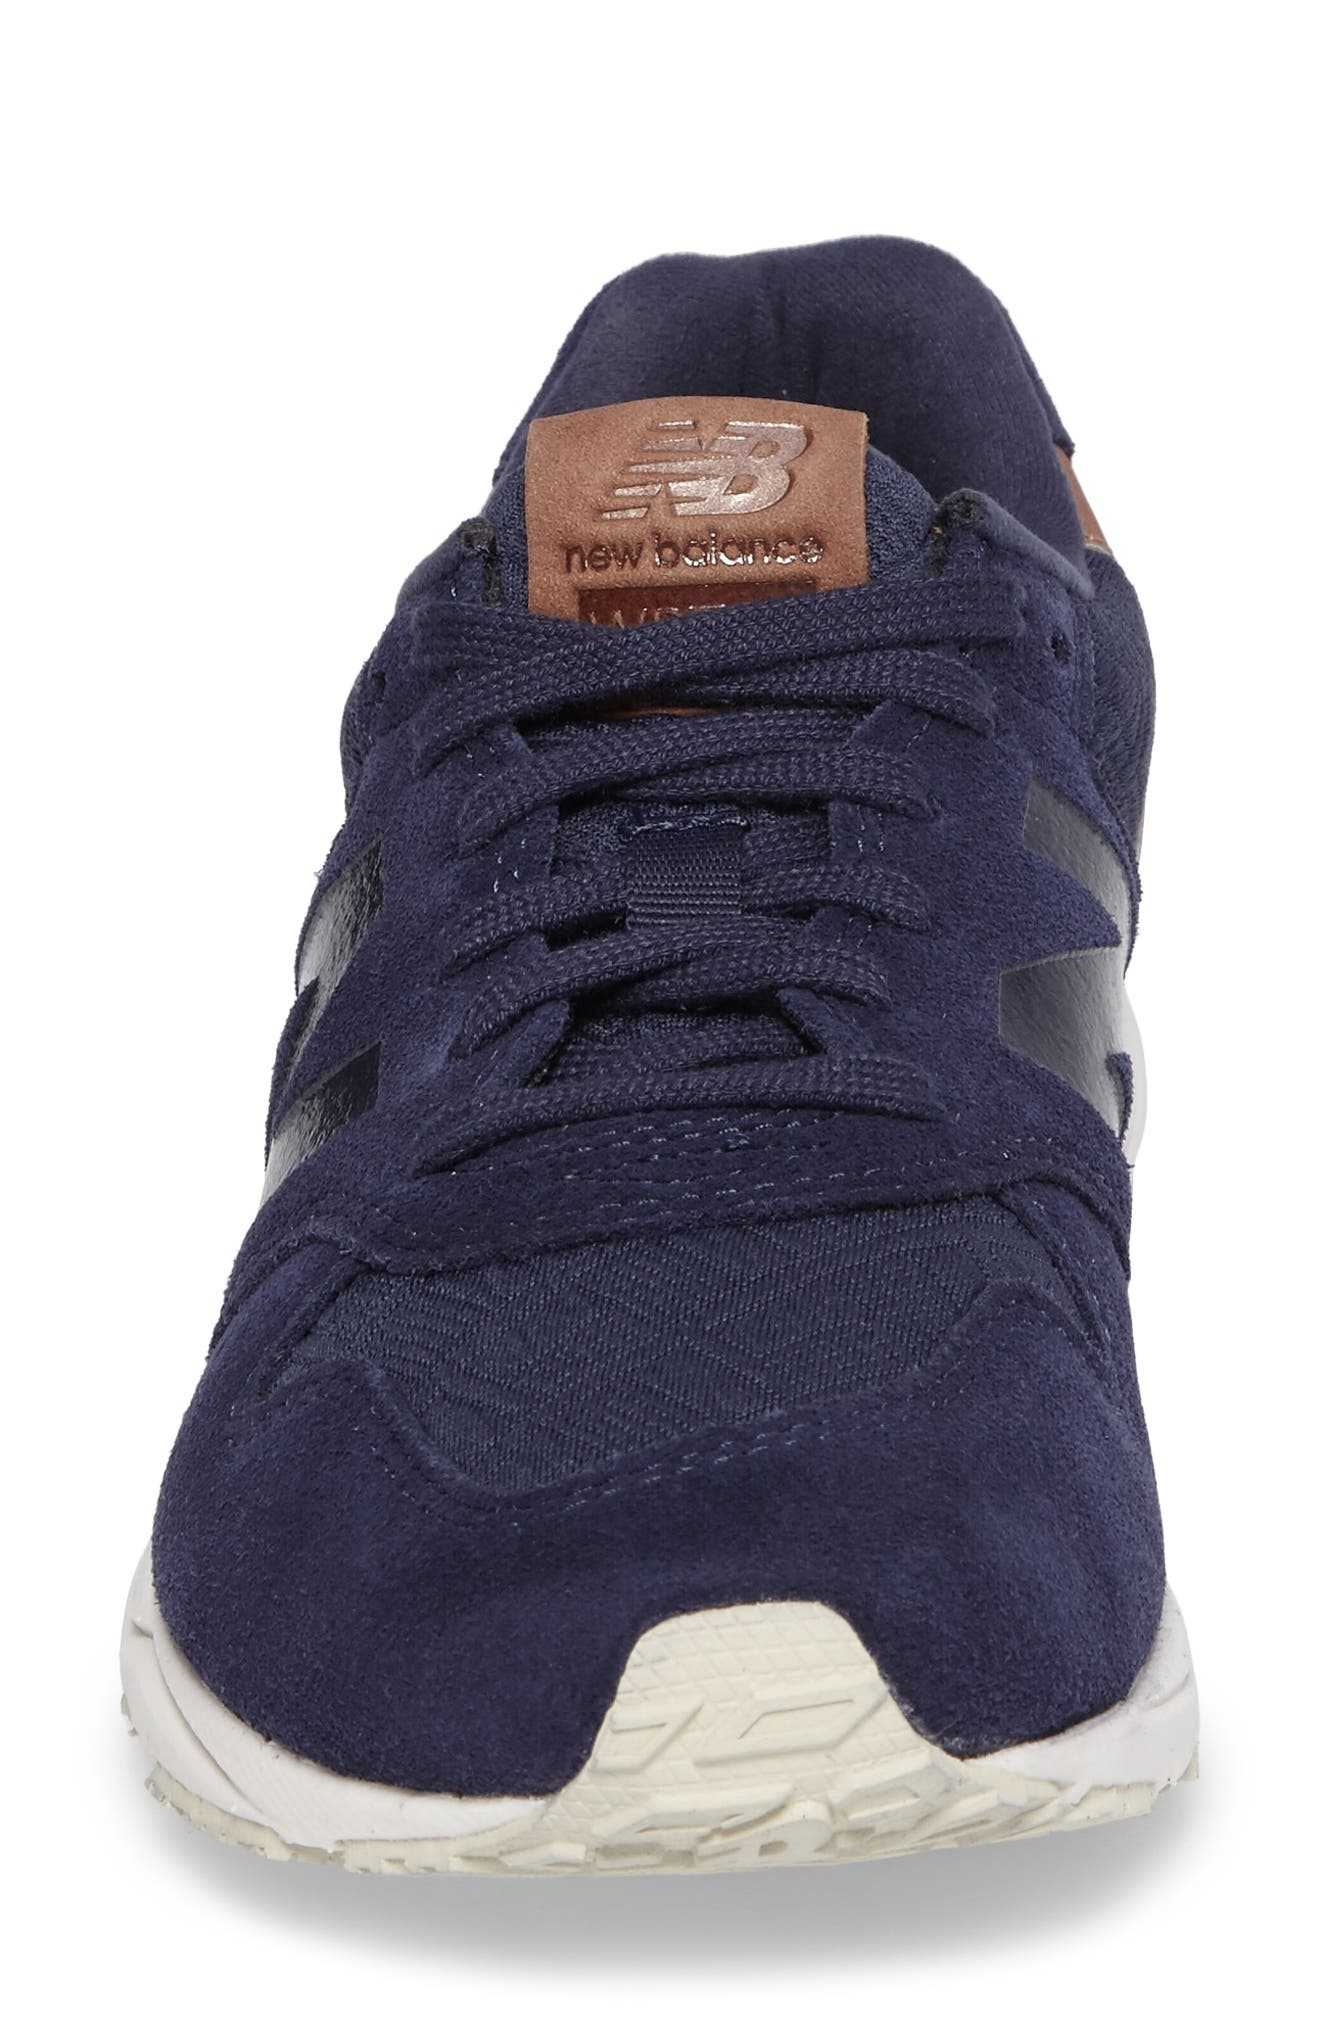 96 Mash-Up Sneaker,                             Alternate thumbnail 23, color,